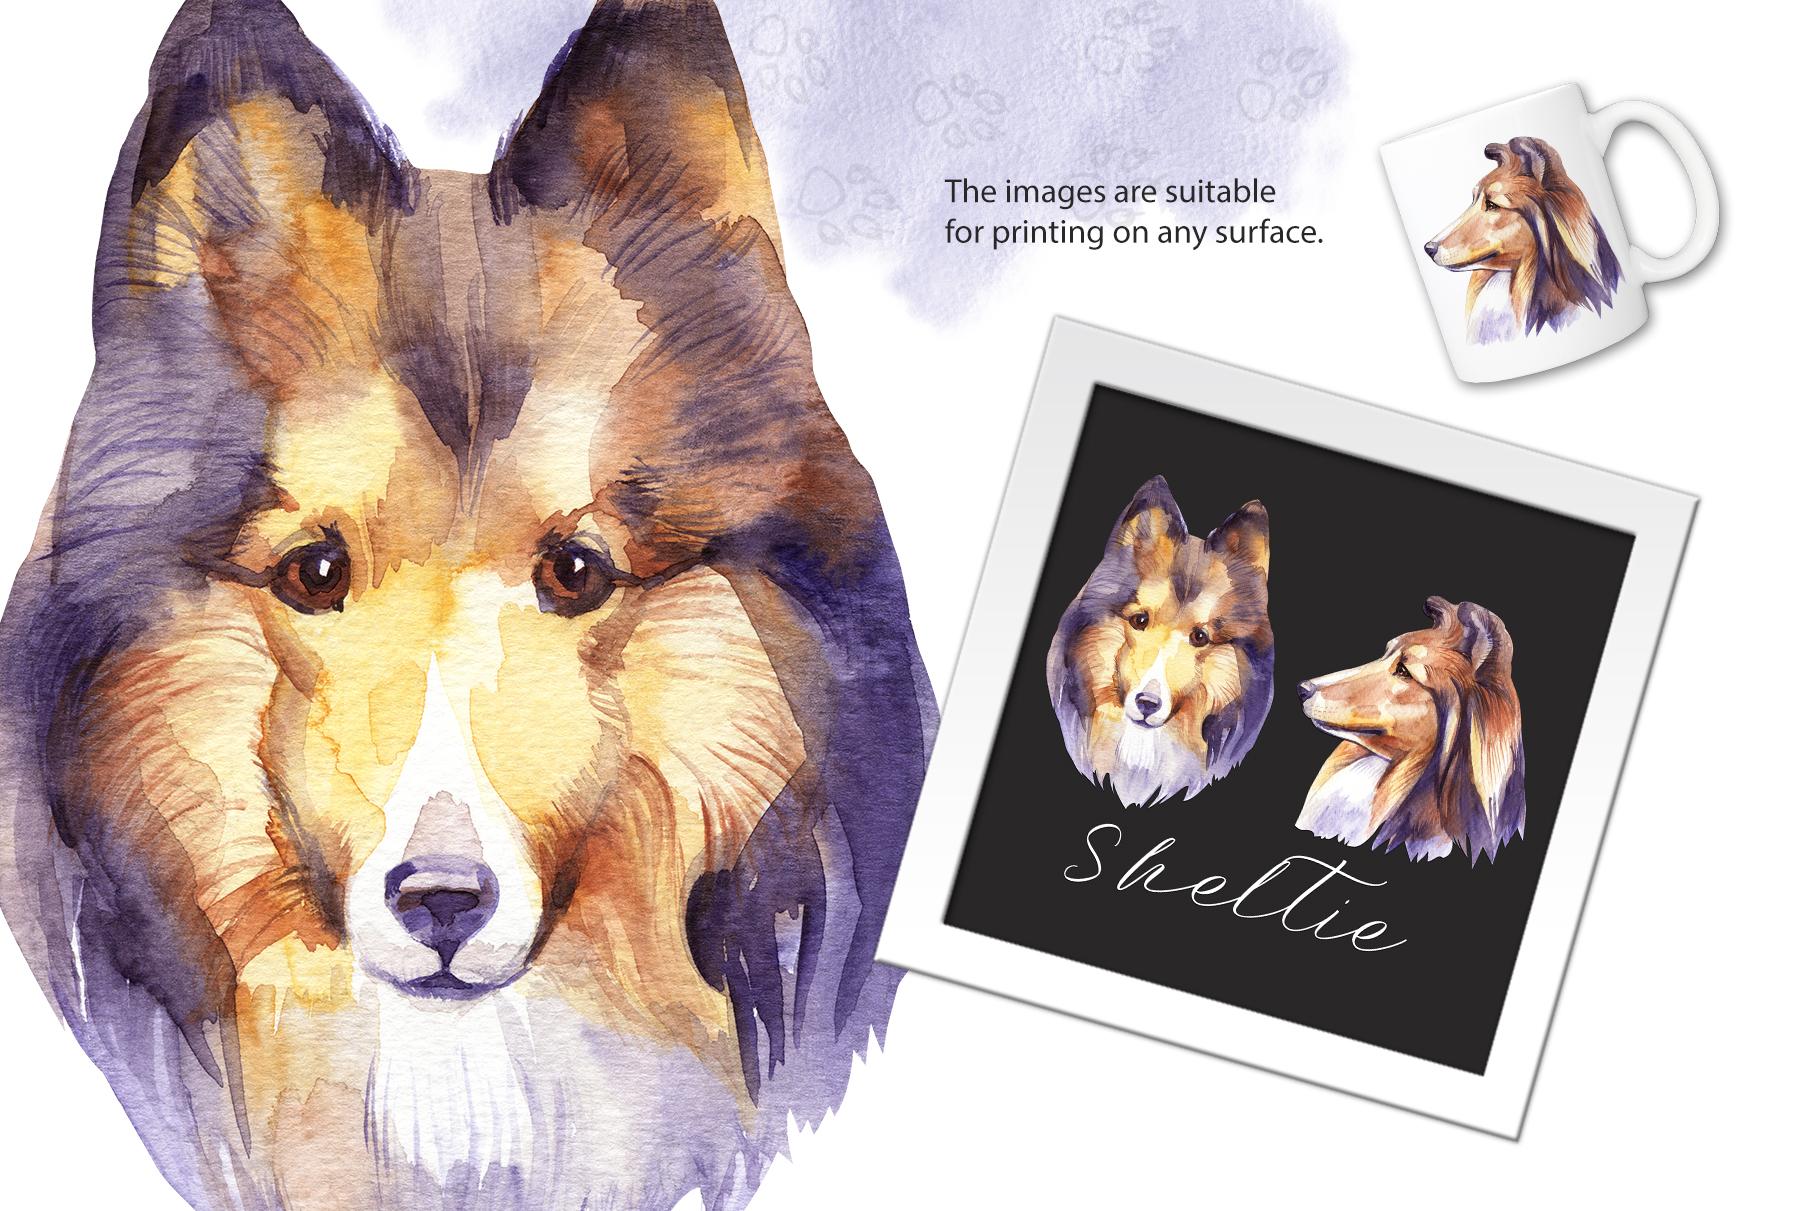 Watercolor dog - Sheltie example image 2